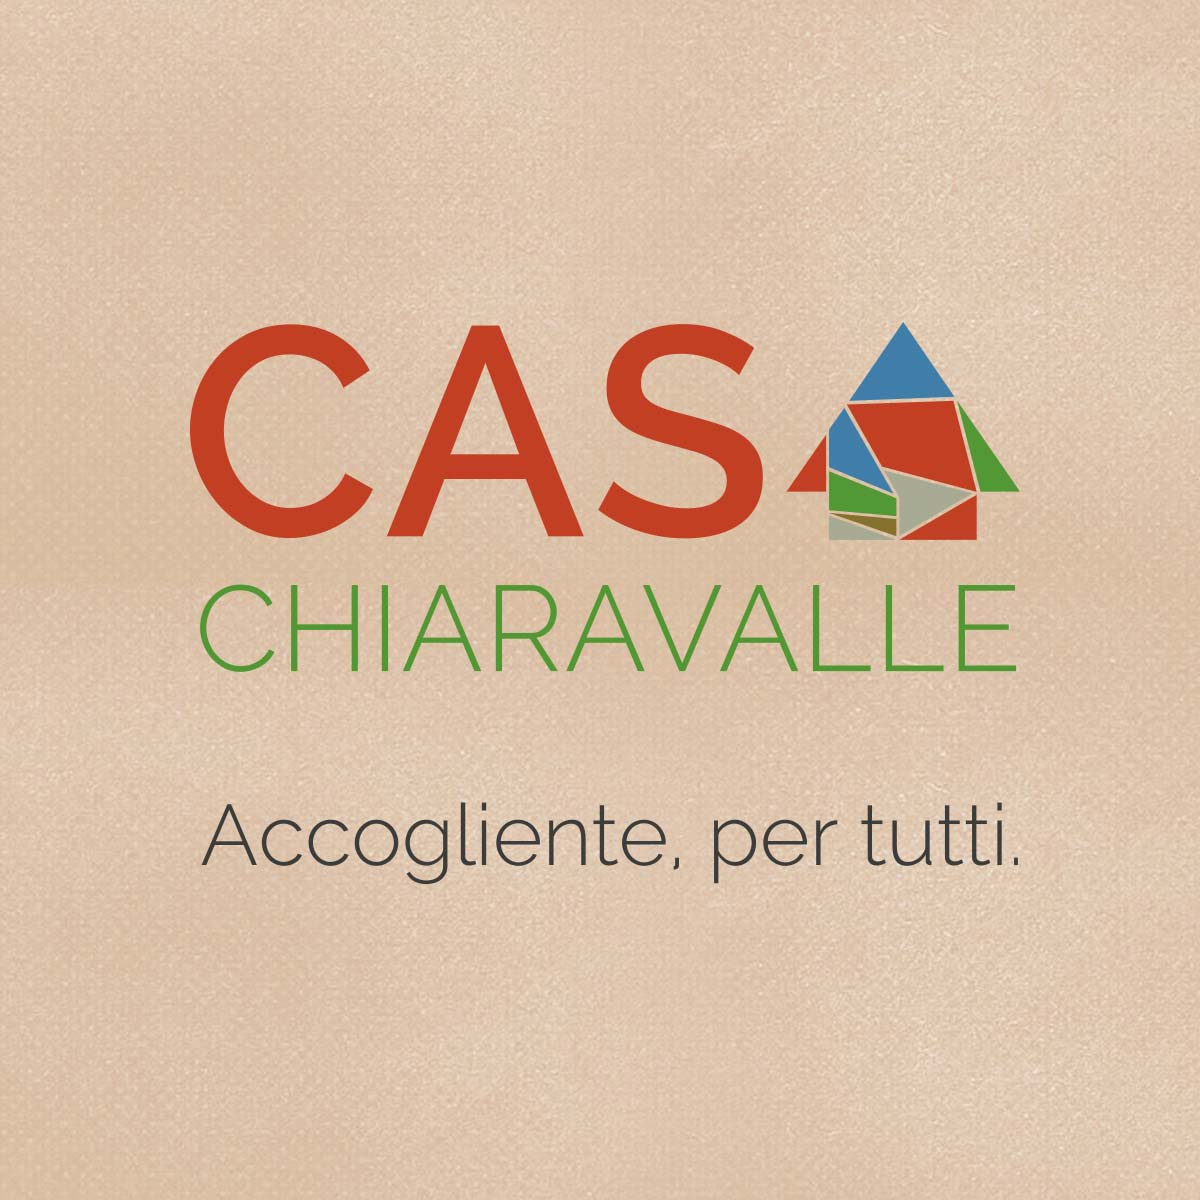 CasaChiaravalle_logo